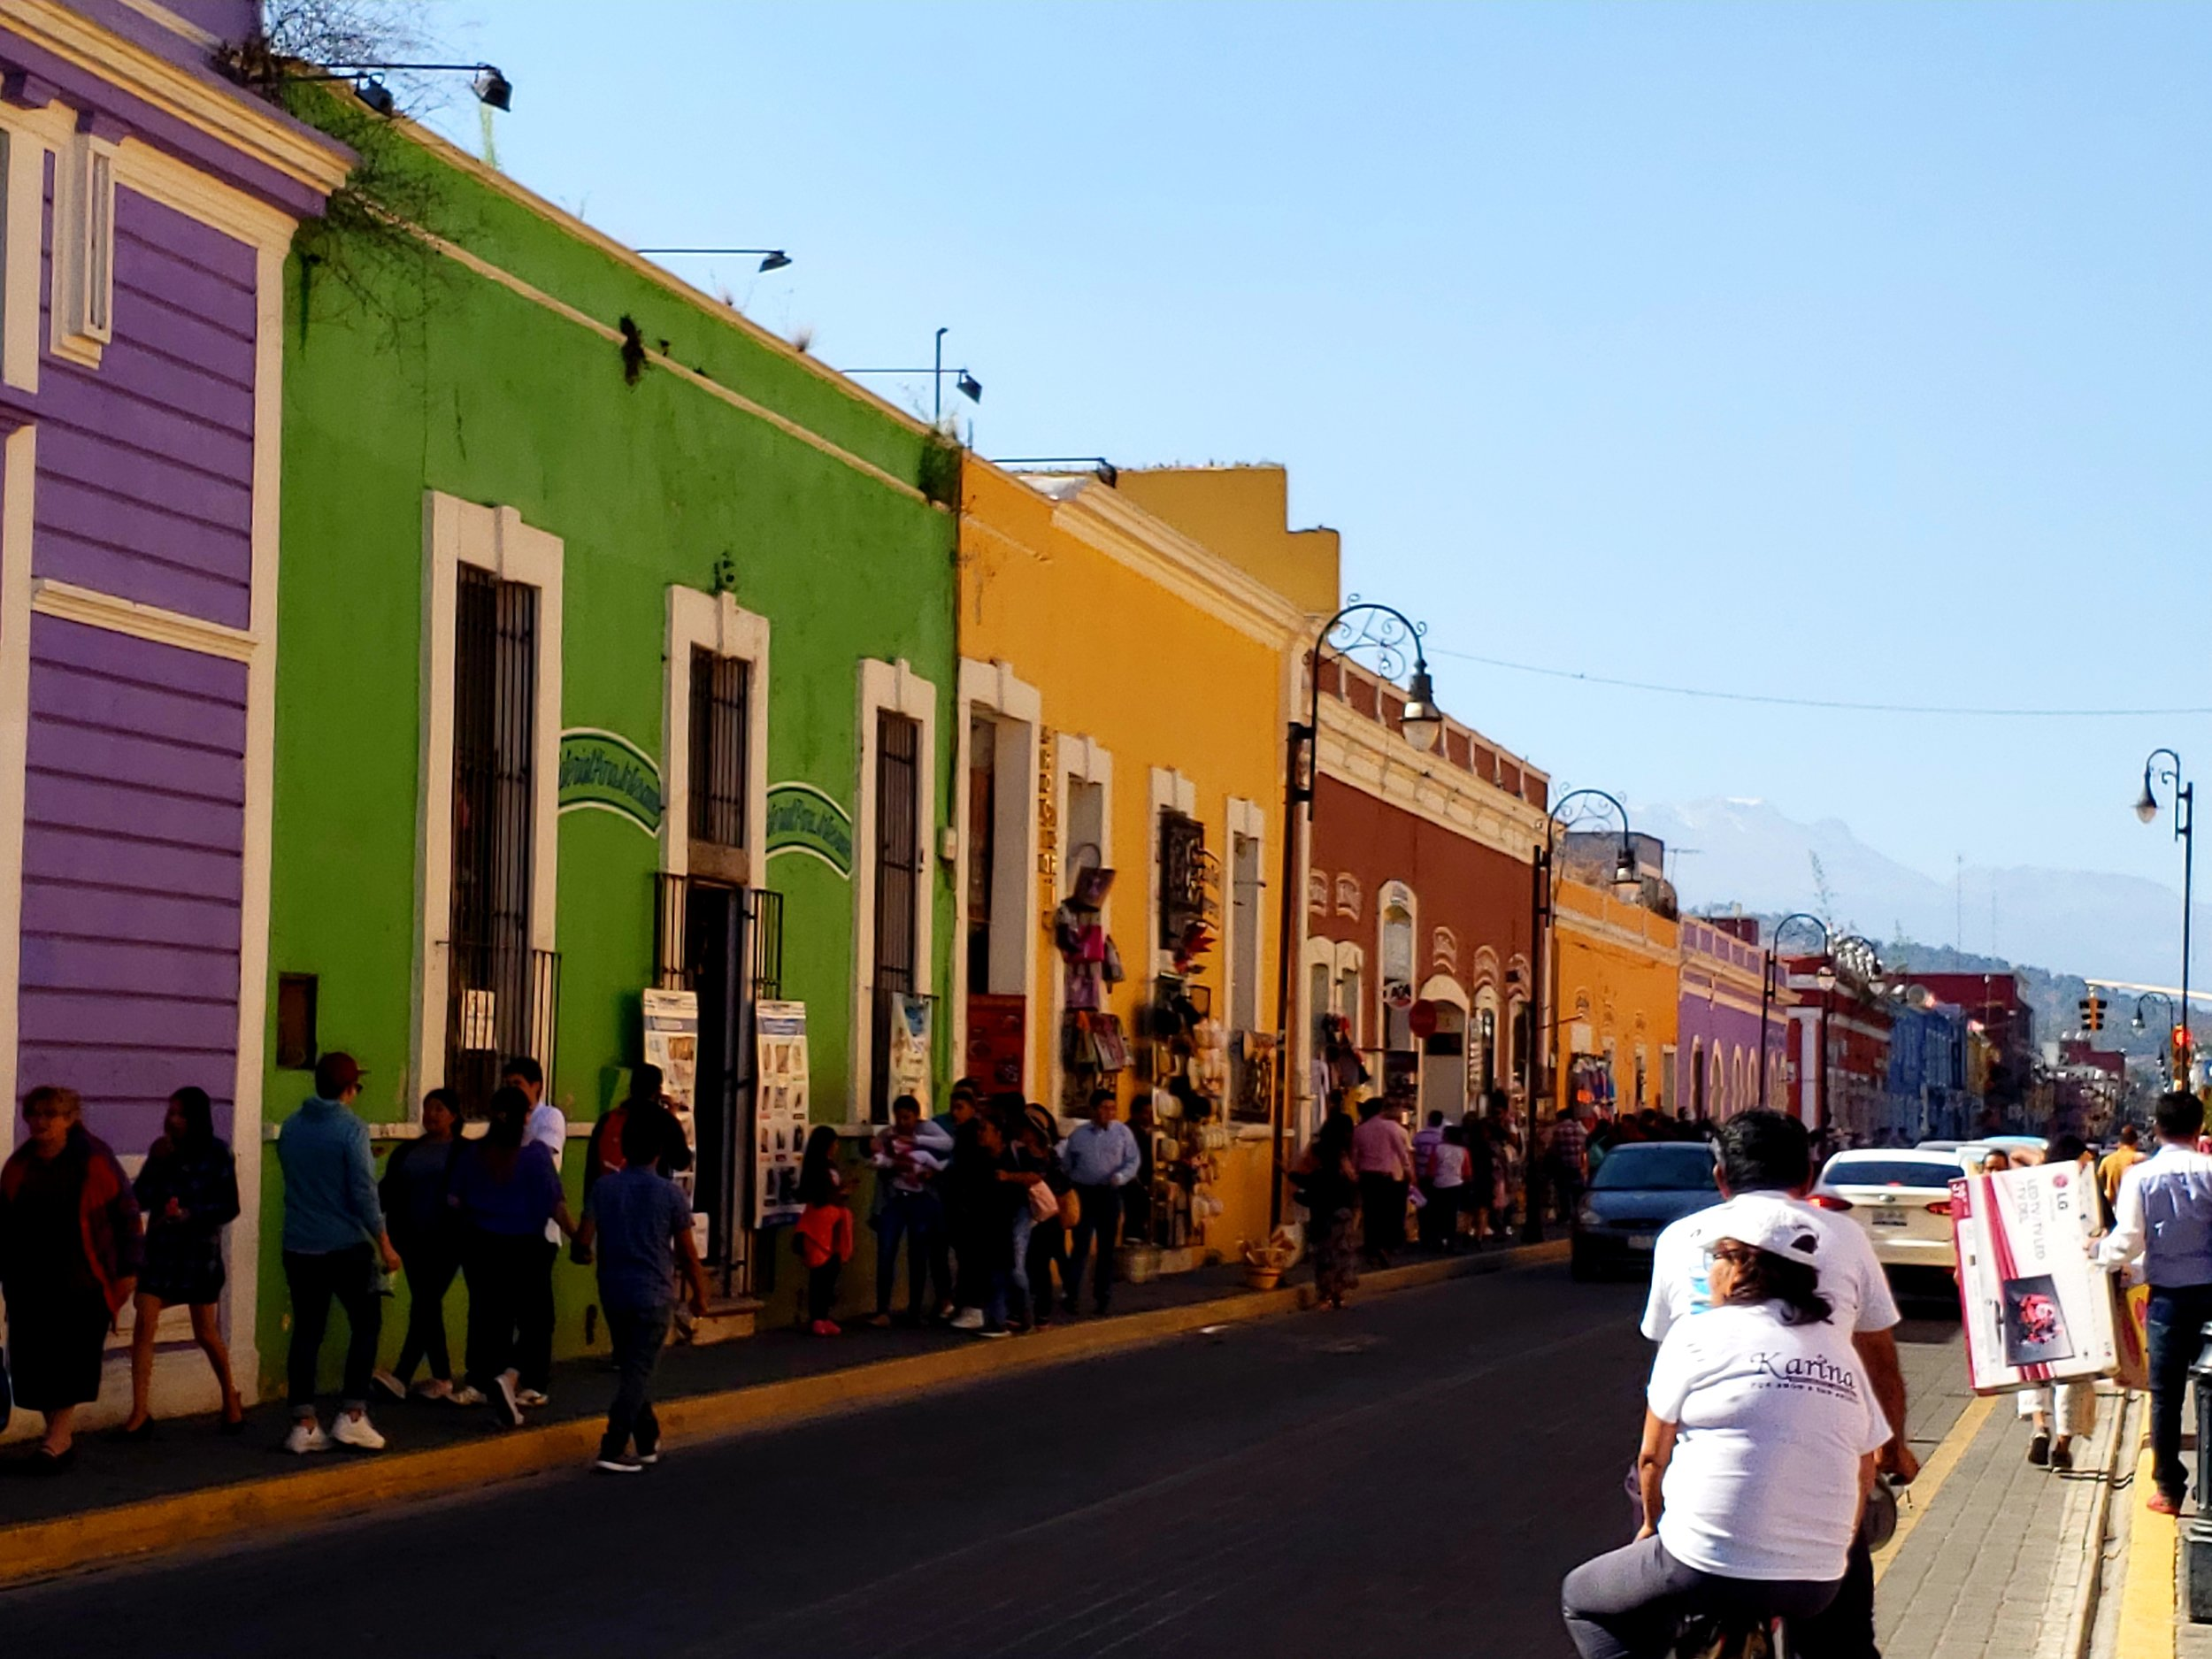 Street scene in Cholula